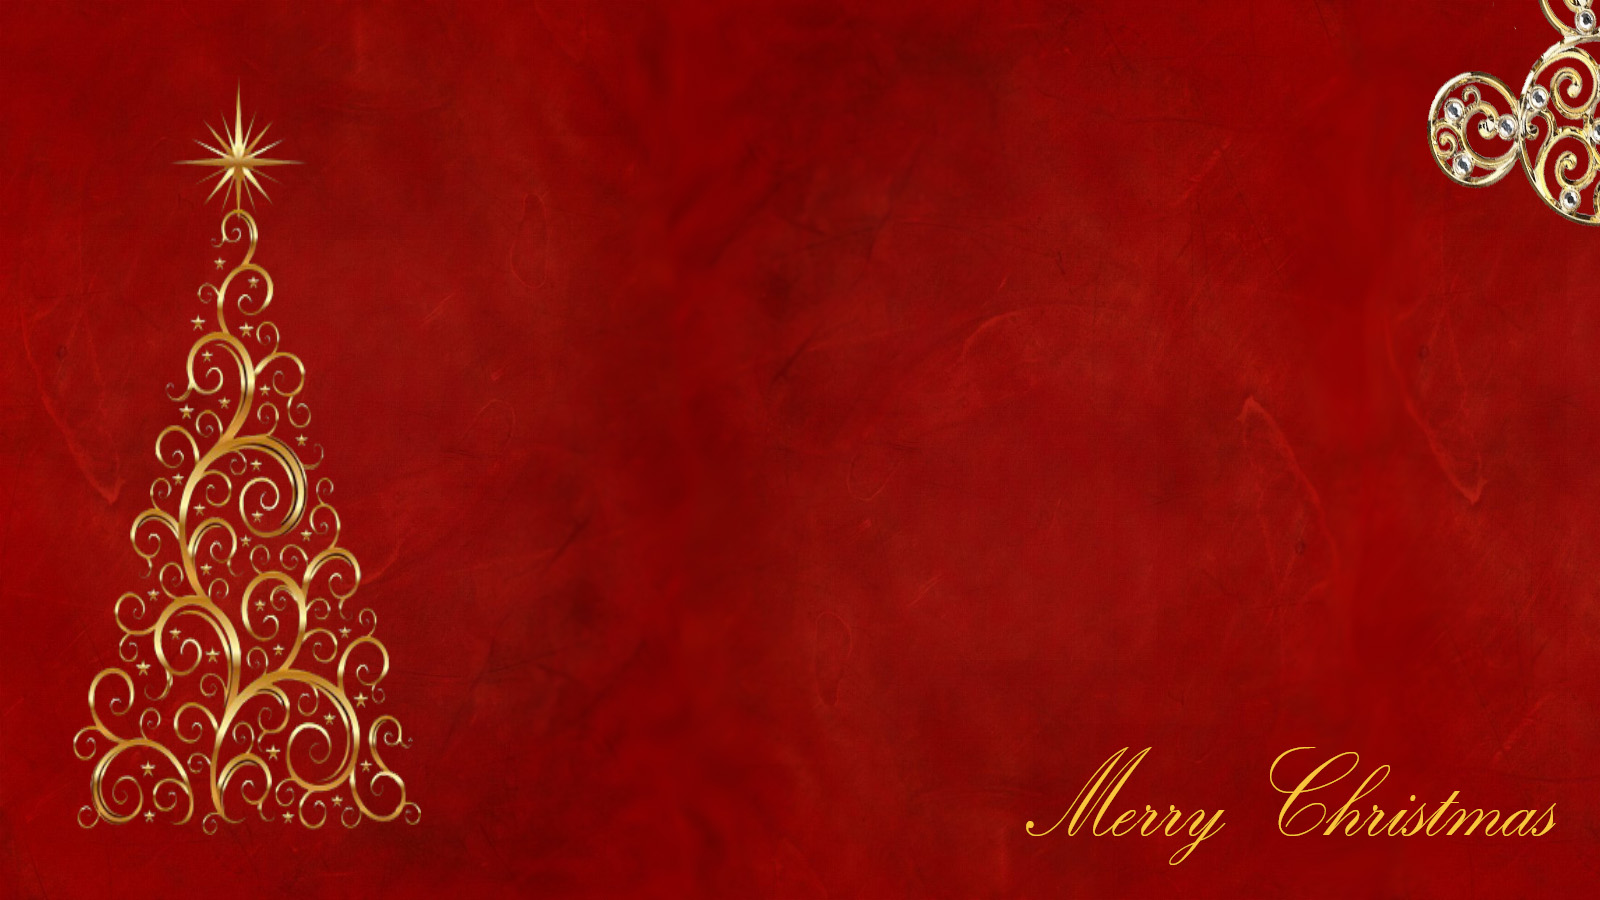 Christmas Backgrounds 2016   Christmas 2016 Backgrounds 1600x900